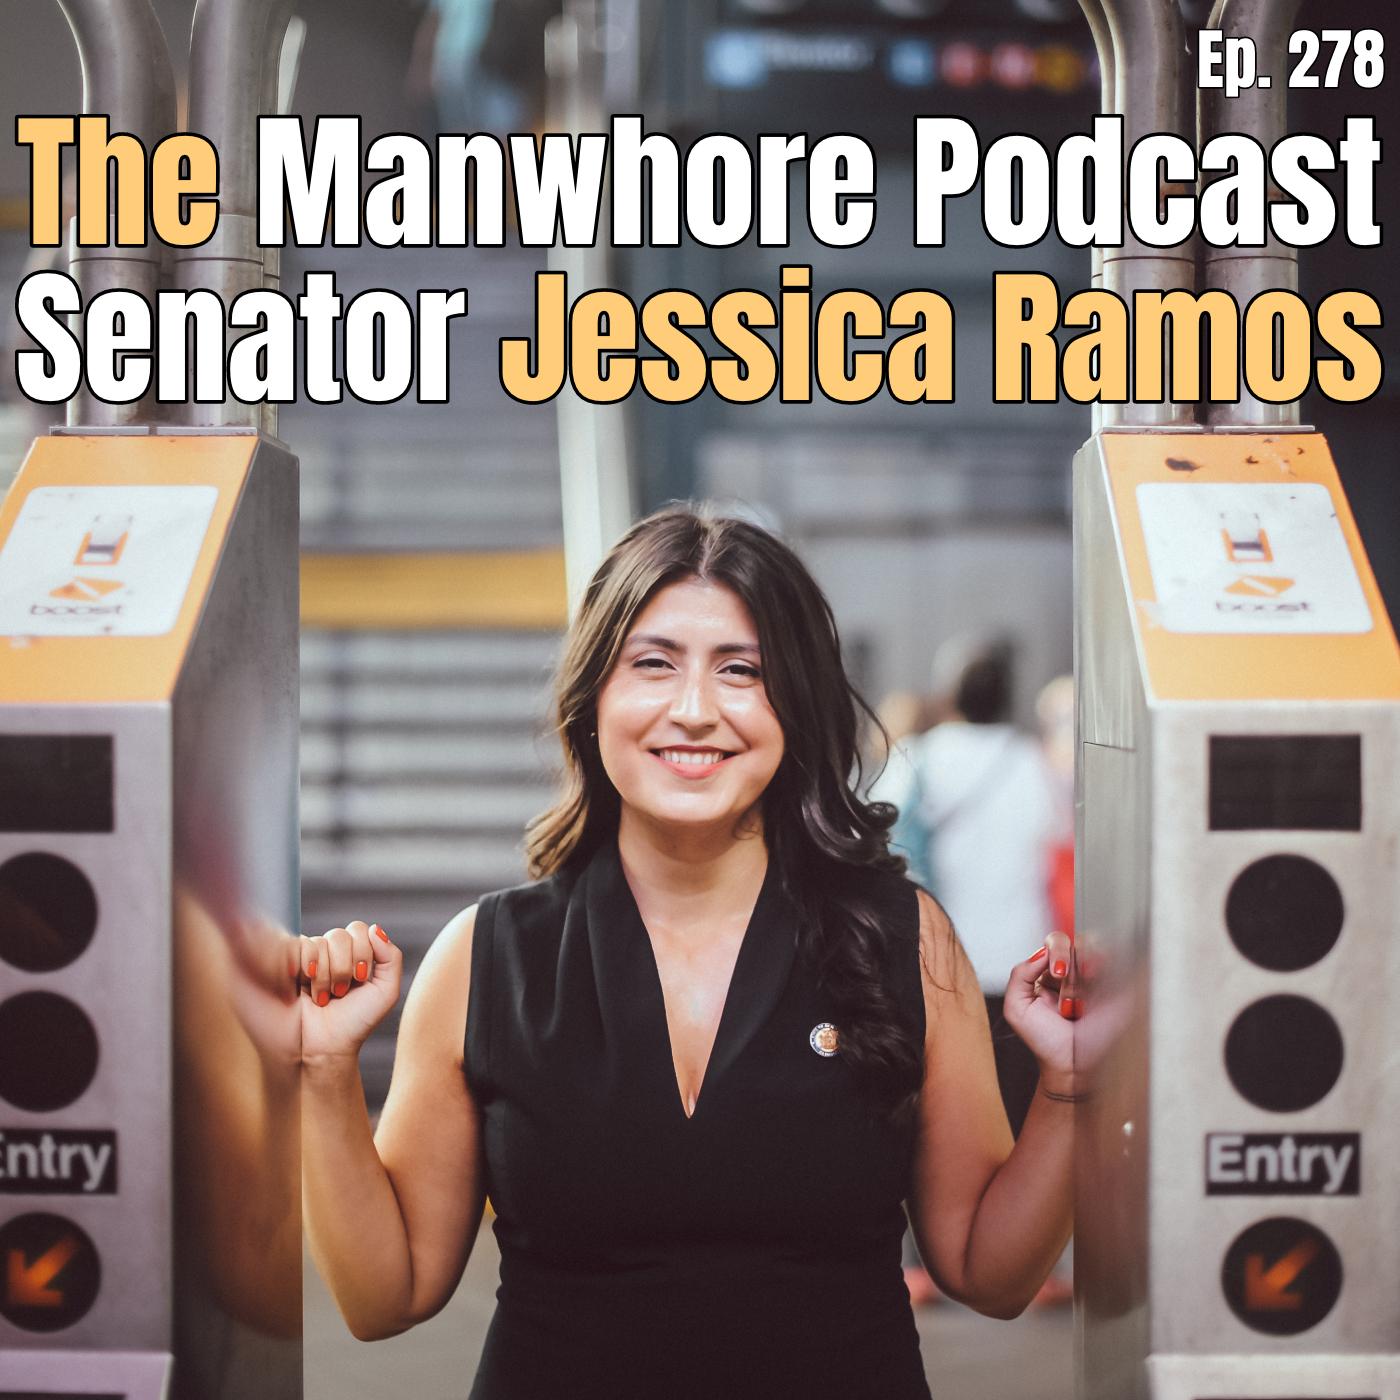 The Manwhore Podcast: A Sex-Positive Quest - Ep. 278: Decriminalize Sex Work with Senator Jessica Ramos